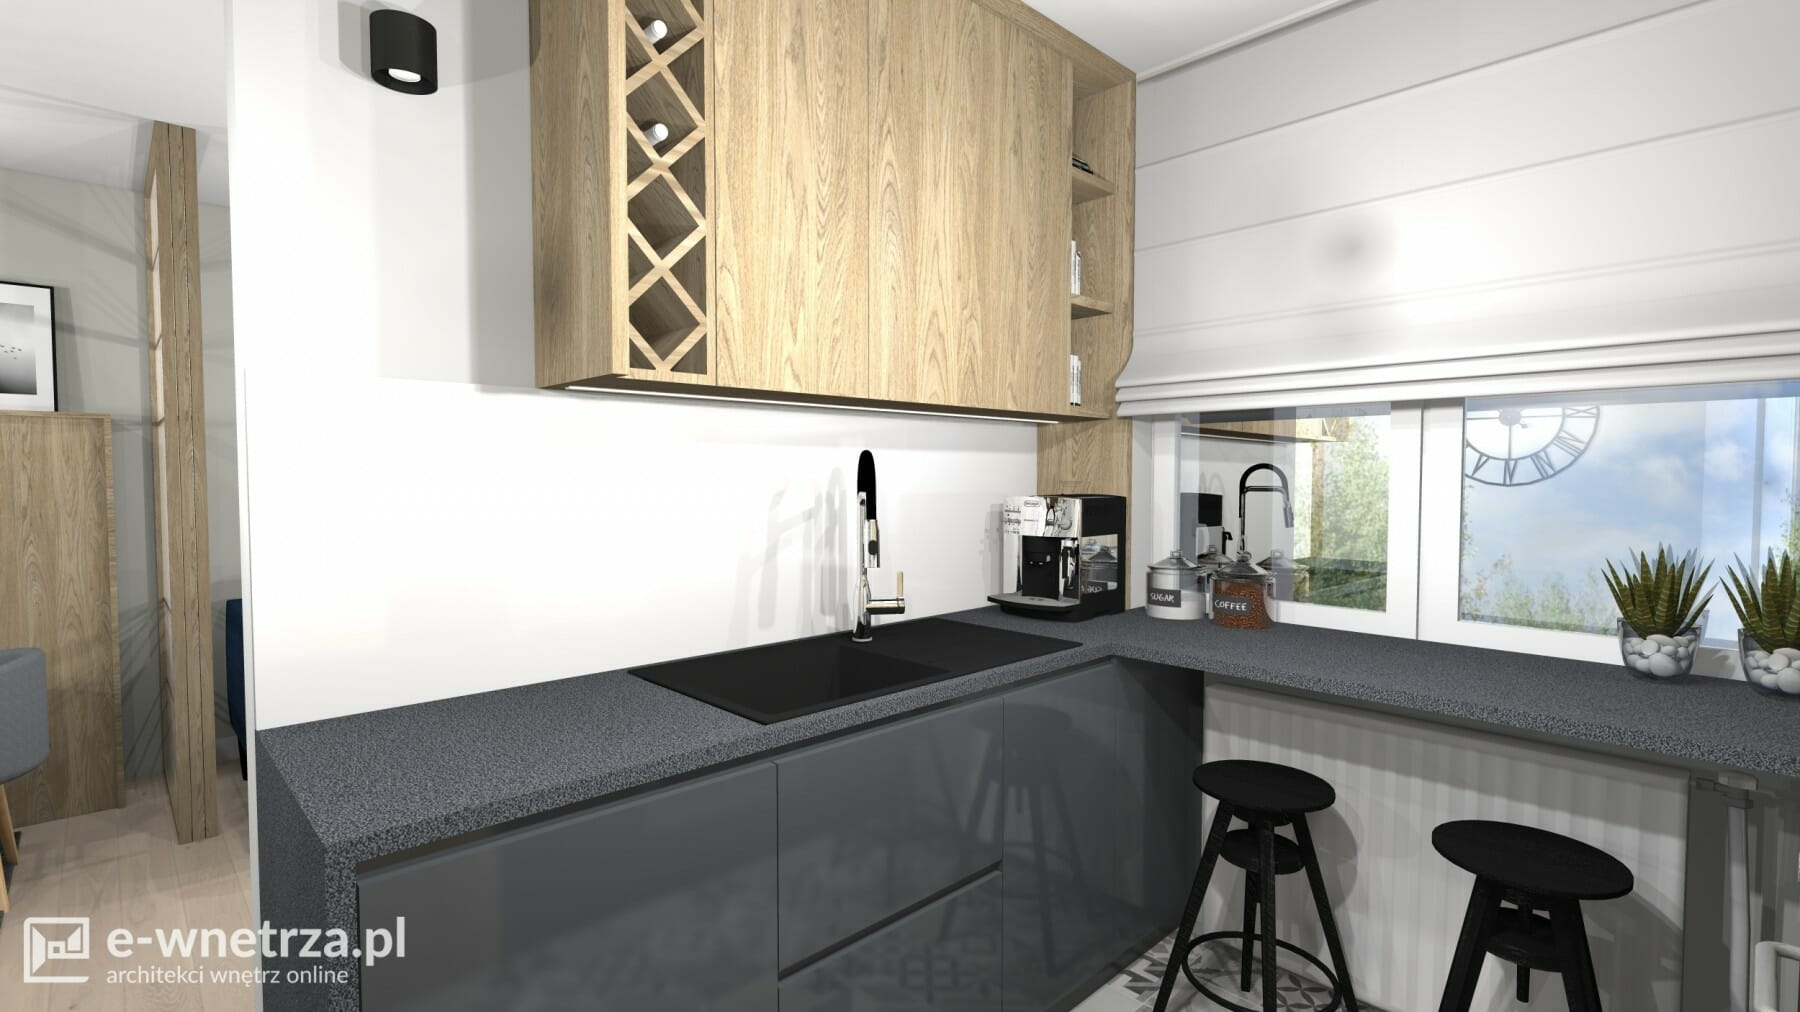 Projekt Salonu Projekt Kuchni Projekty E Wnetrzapl